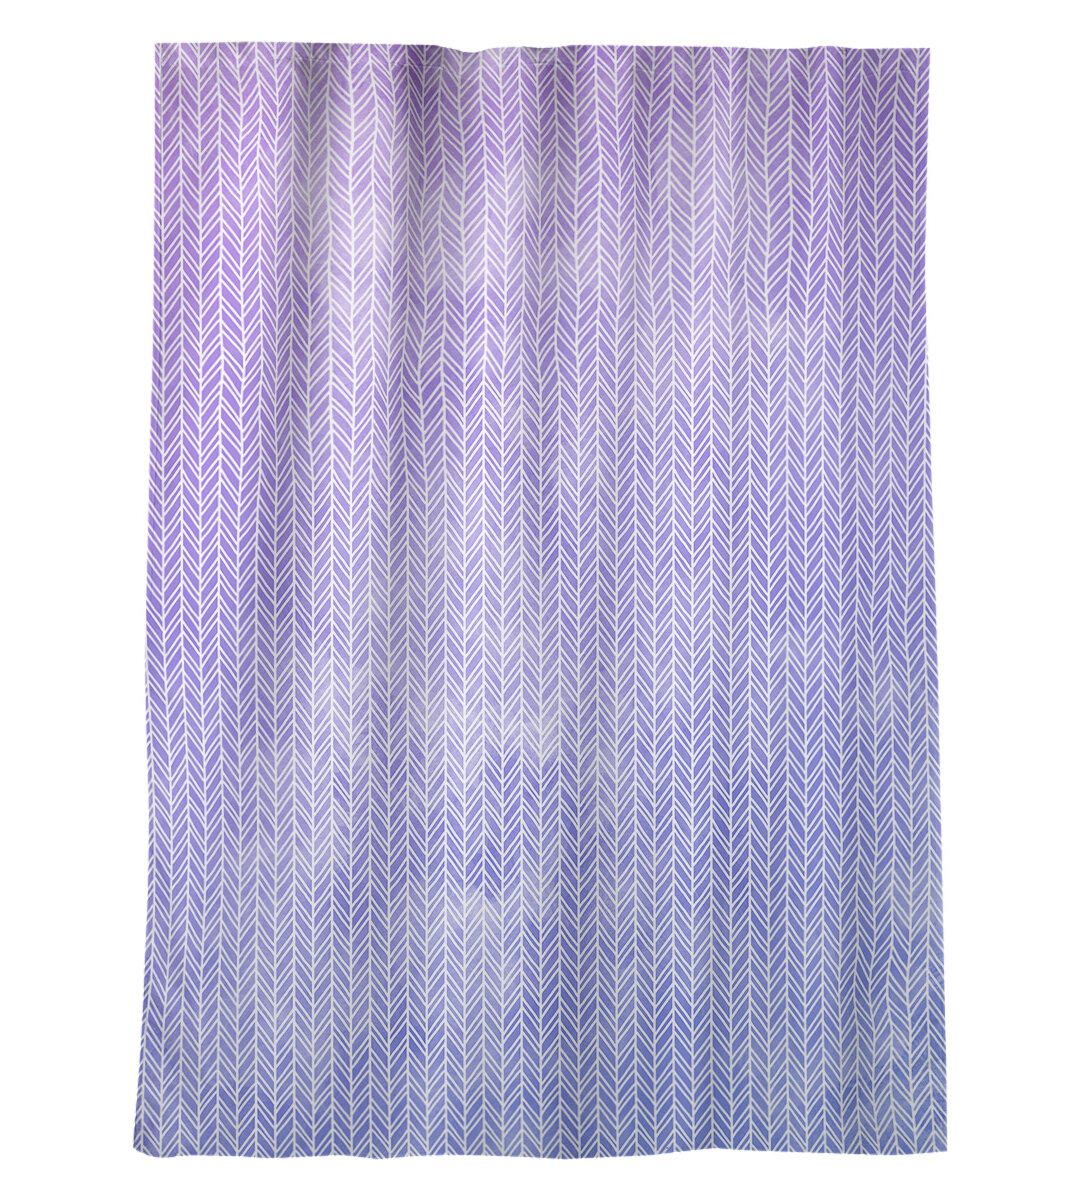 Latitude Run Avicia Herringbone Window Chevron Room Darkening Thermal Rod Pocket Single Curtain Panel Wayfair